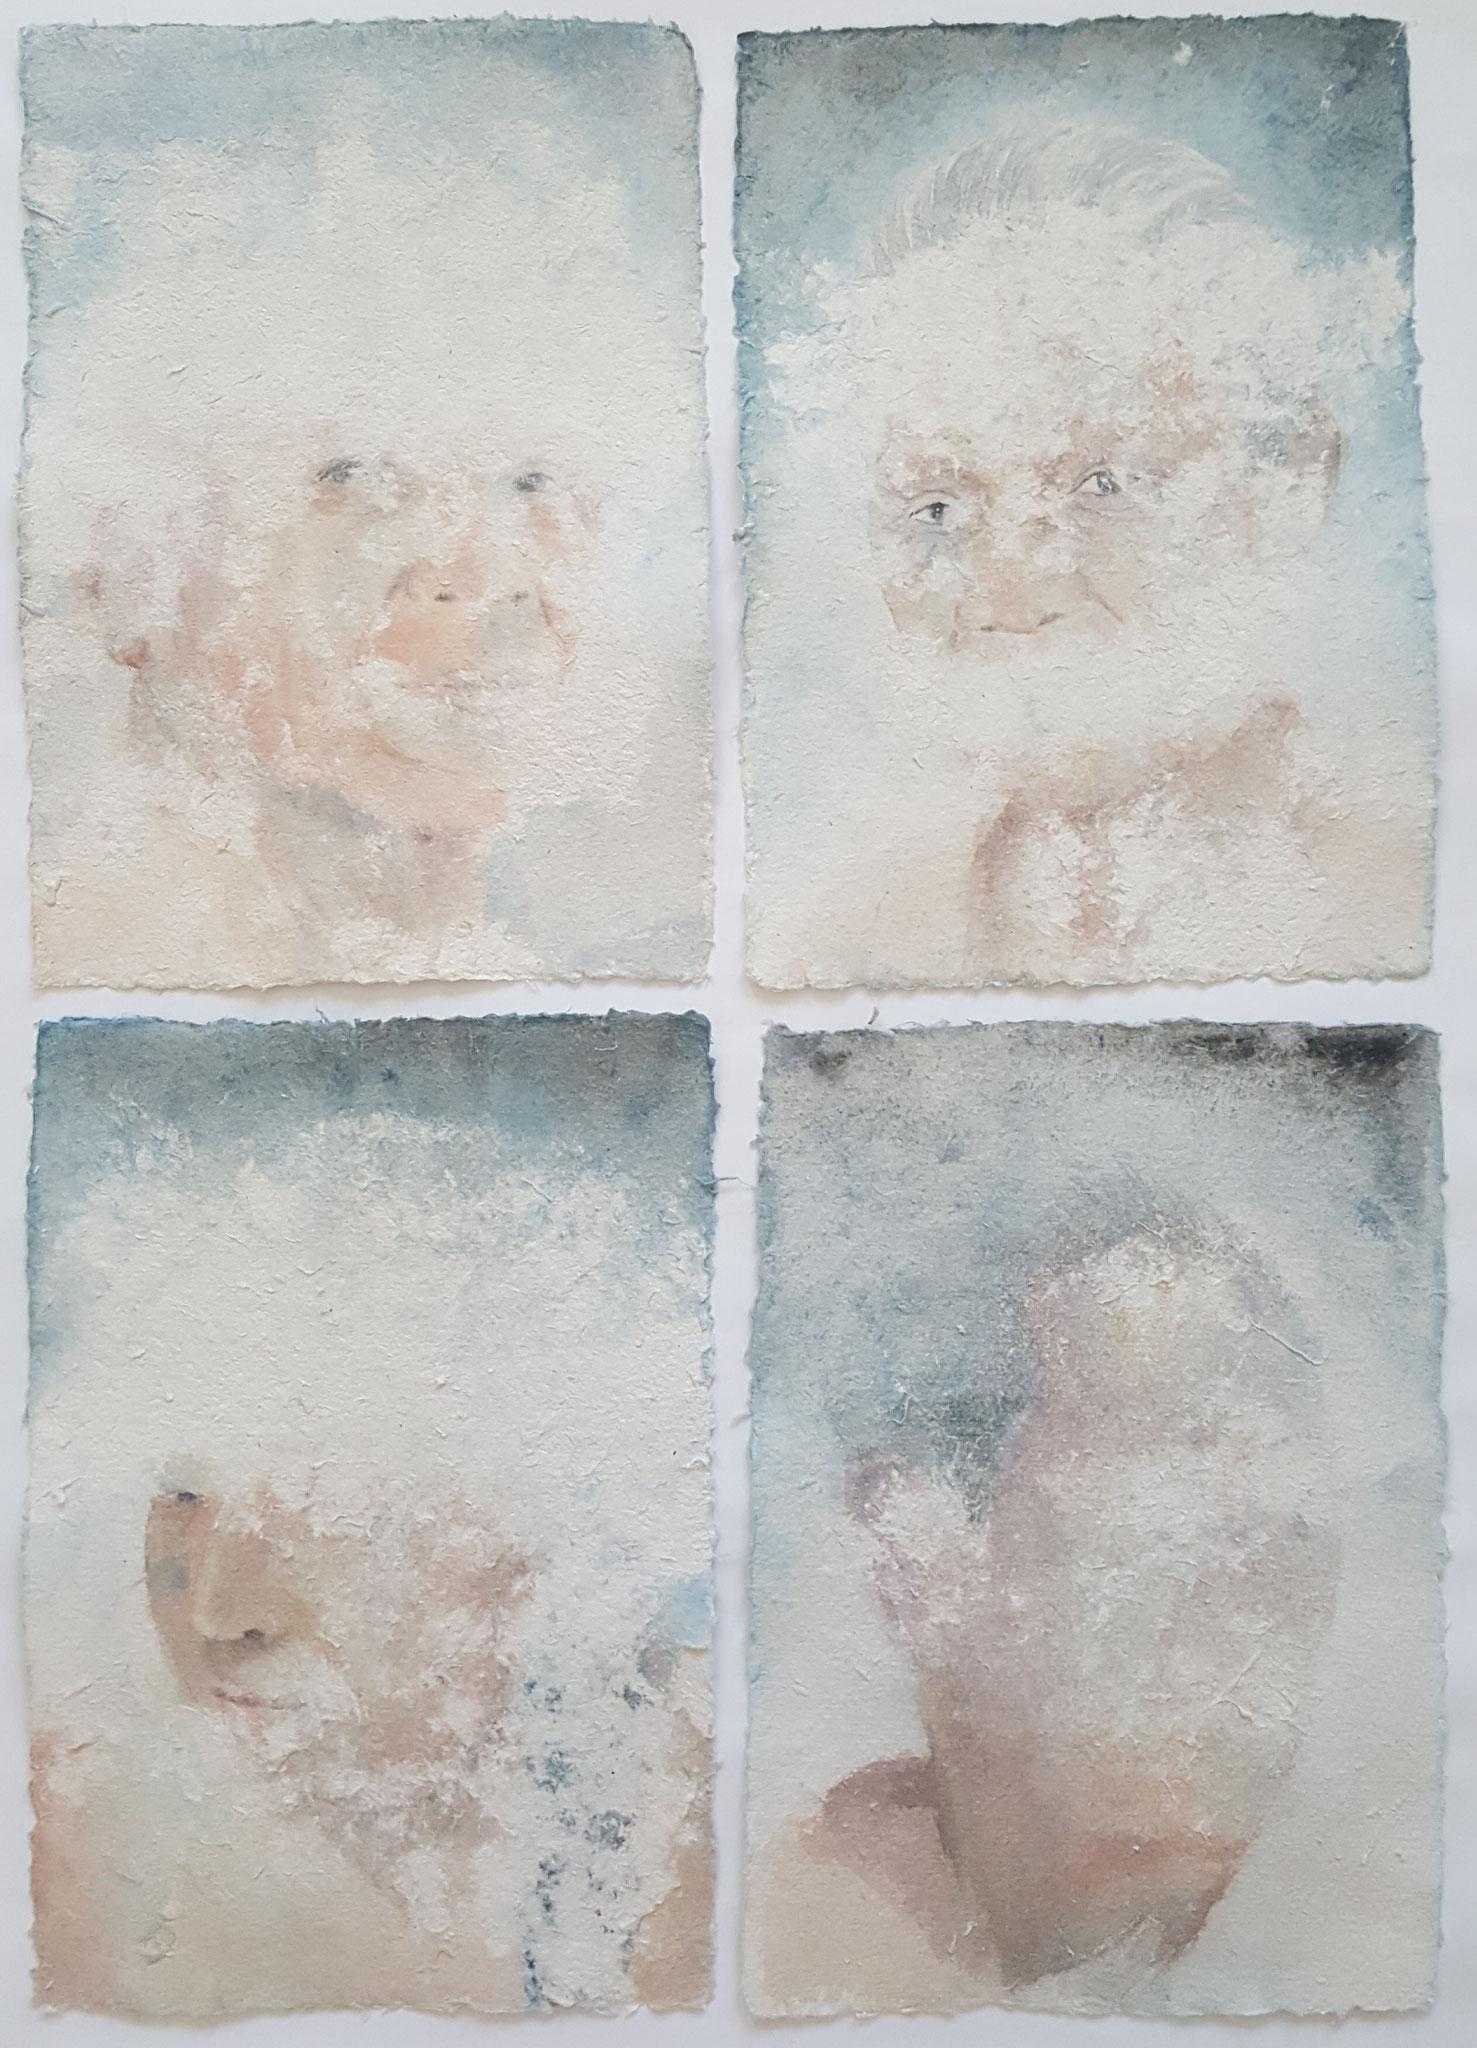 Des-aparecidos XIX, 2018, Polyptichon á 20 x 30 cm, Aquarela sobre papel